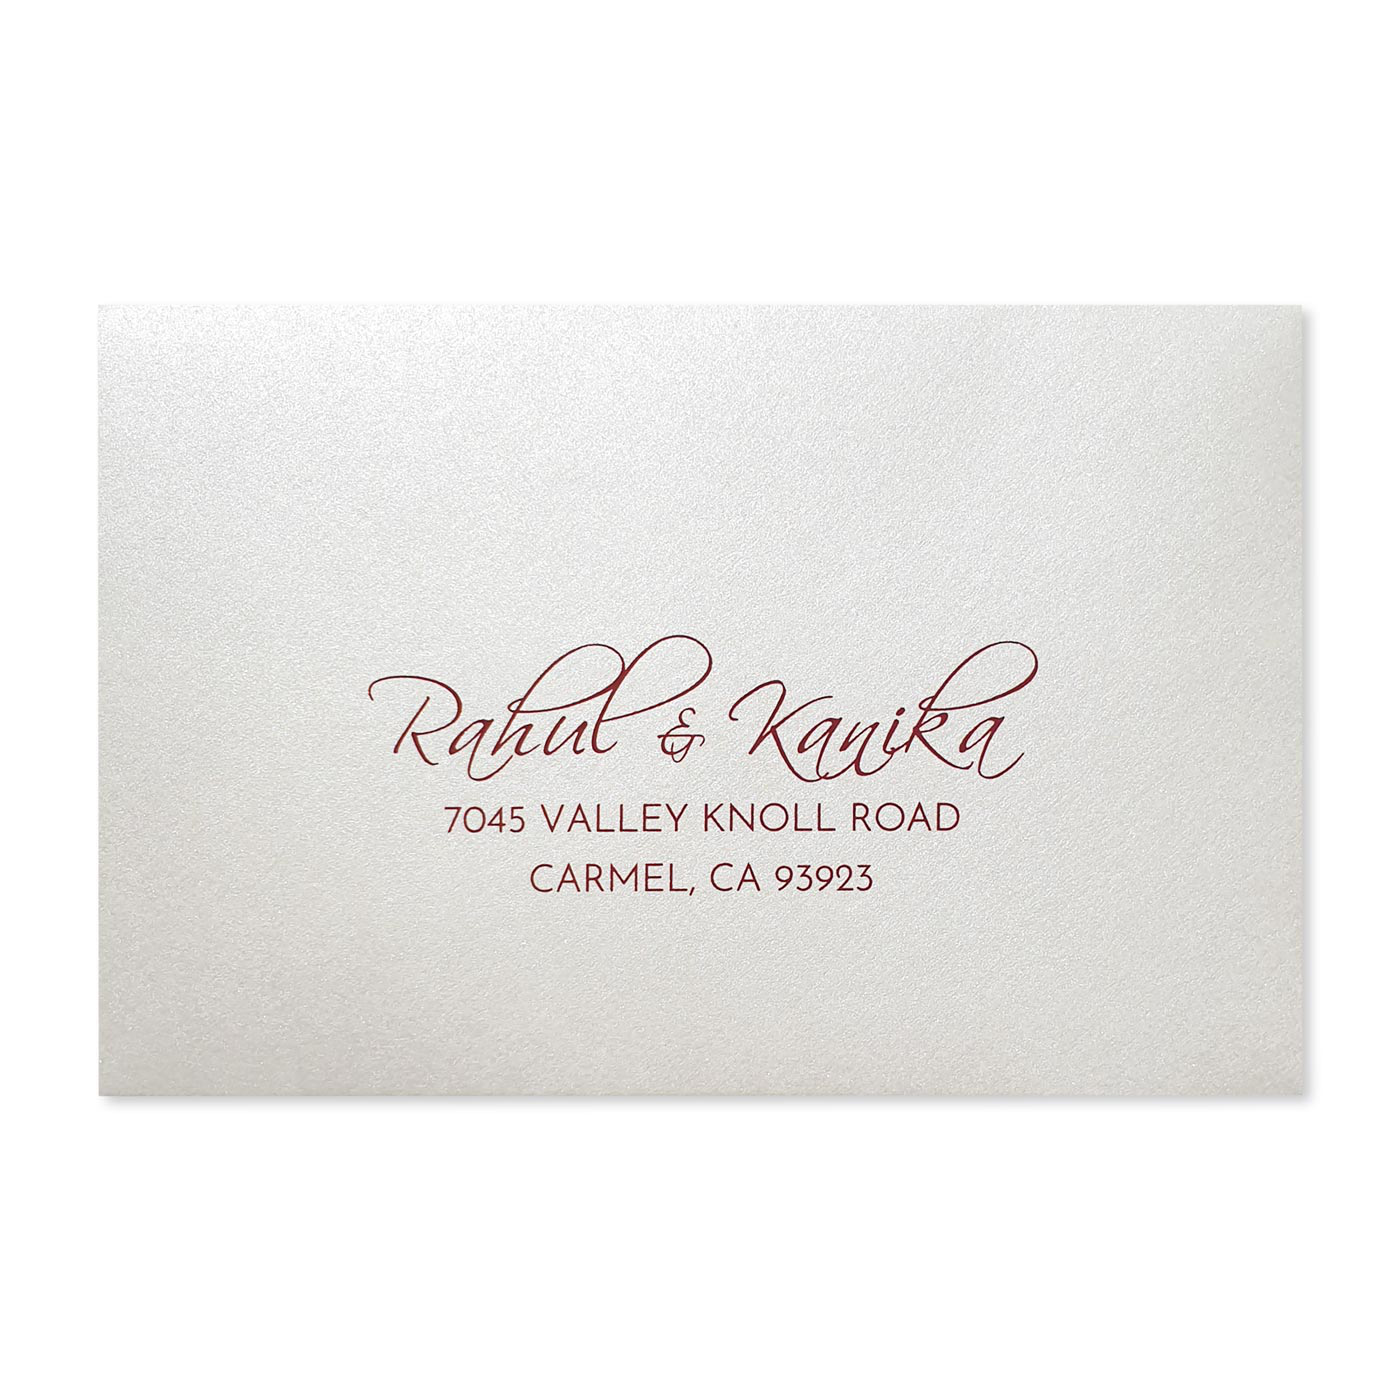 RSVP Cards : RSVP-CHERRY_CRUSH - 123WeddingCards